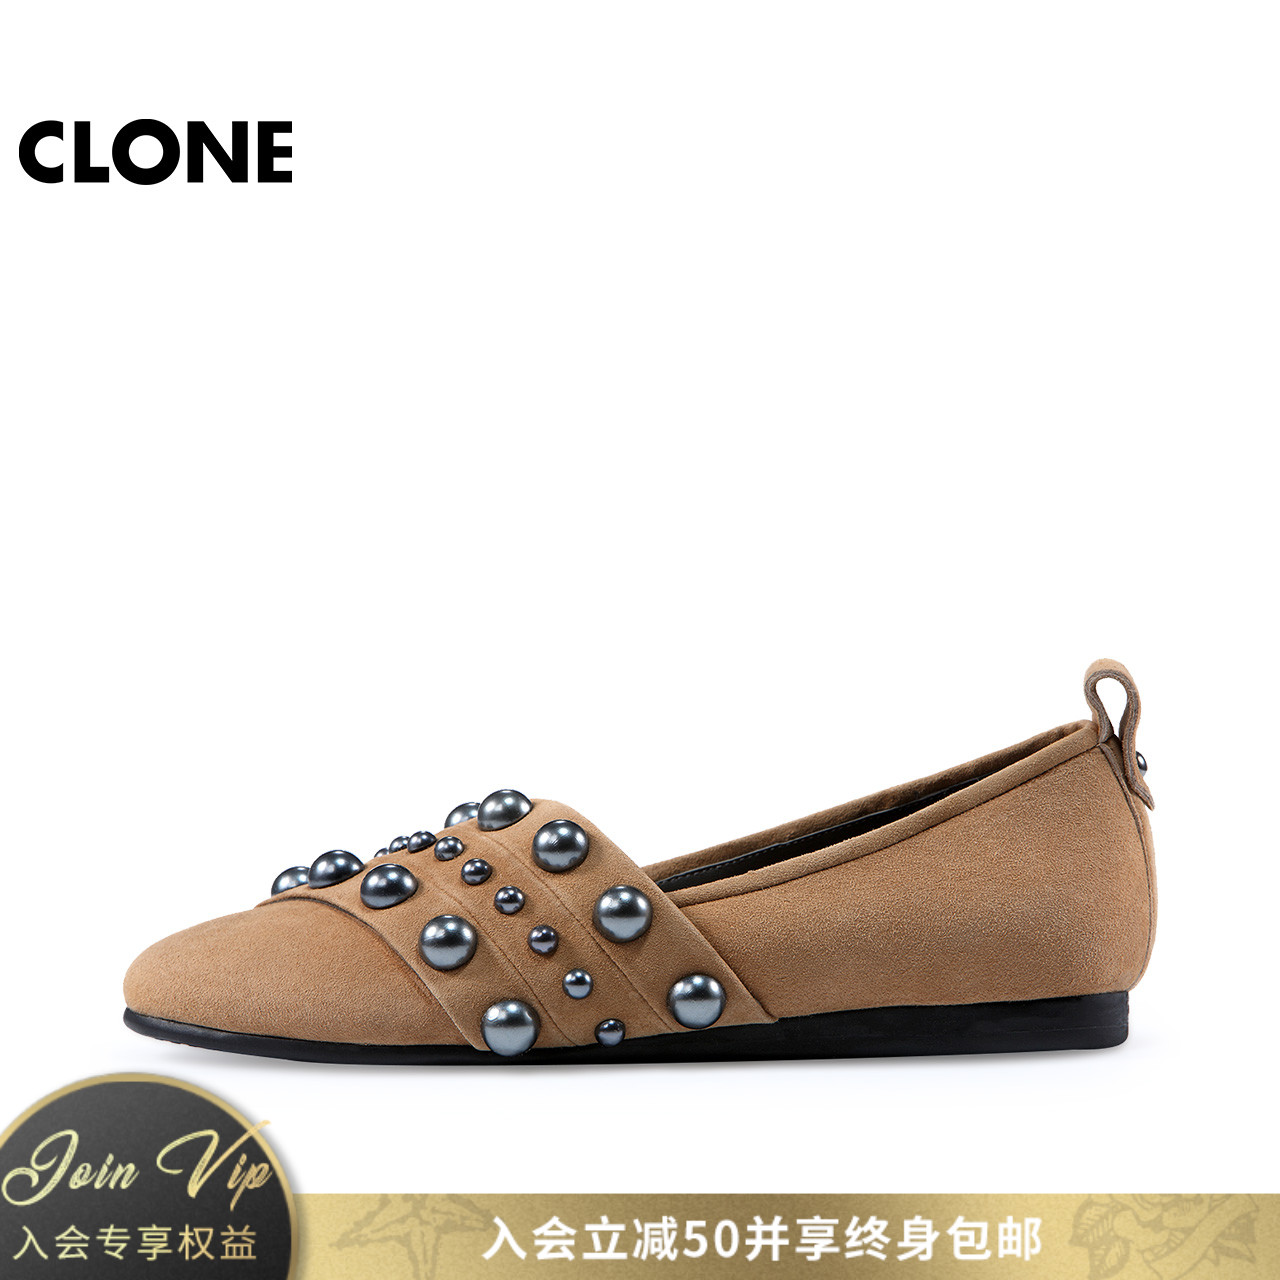 CLONE女鞋秋季新款JEM系列时尚钉珠拼接浅口休闲单鞋低帮鞋